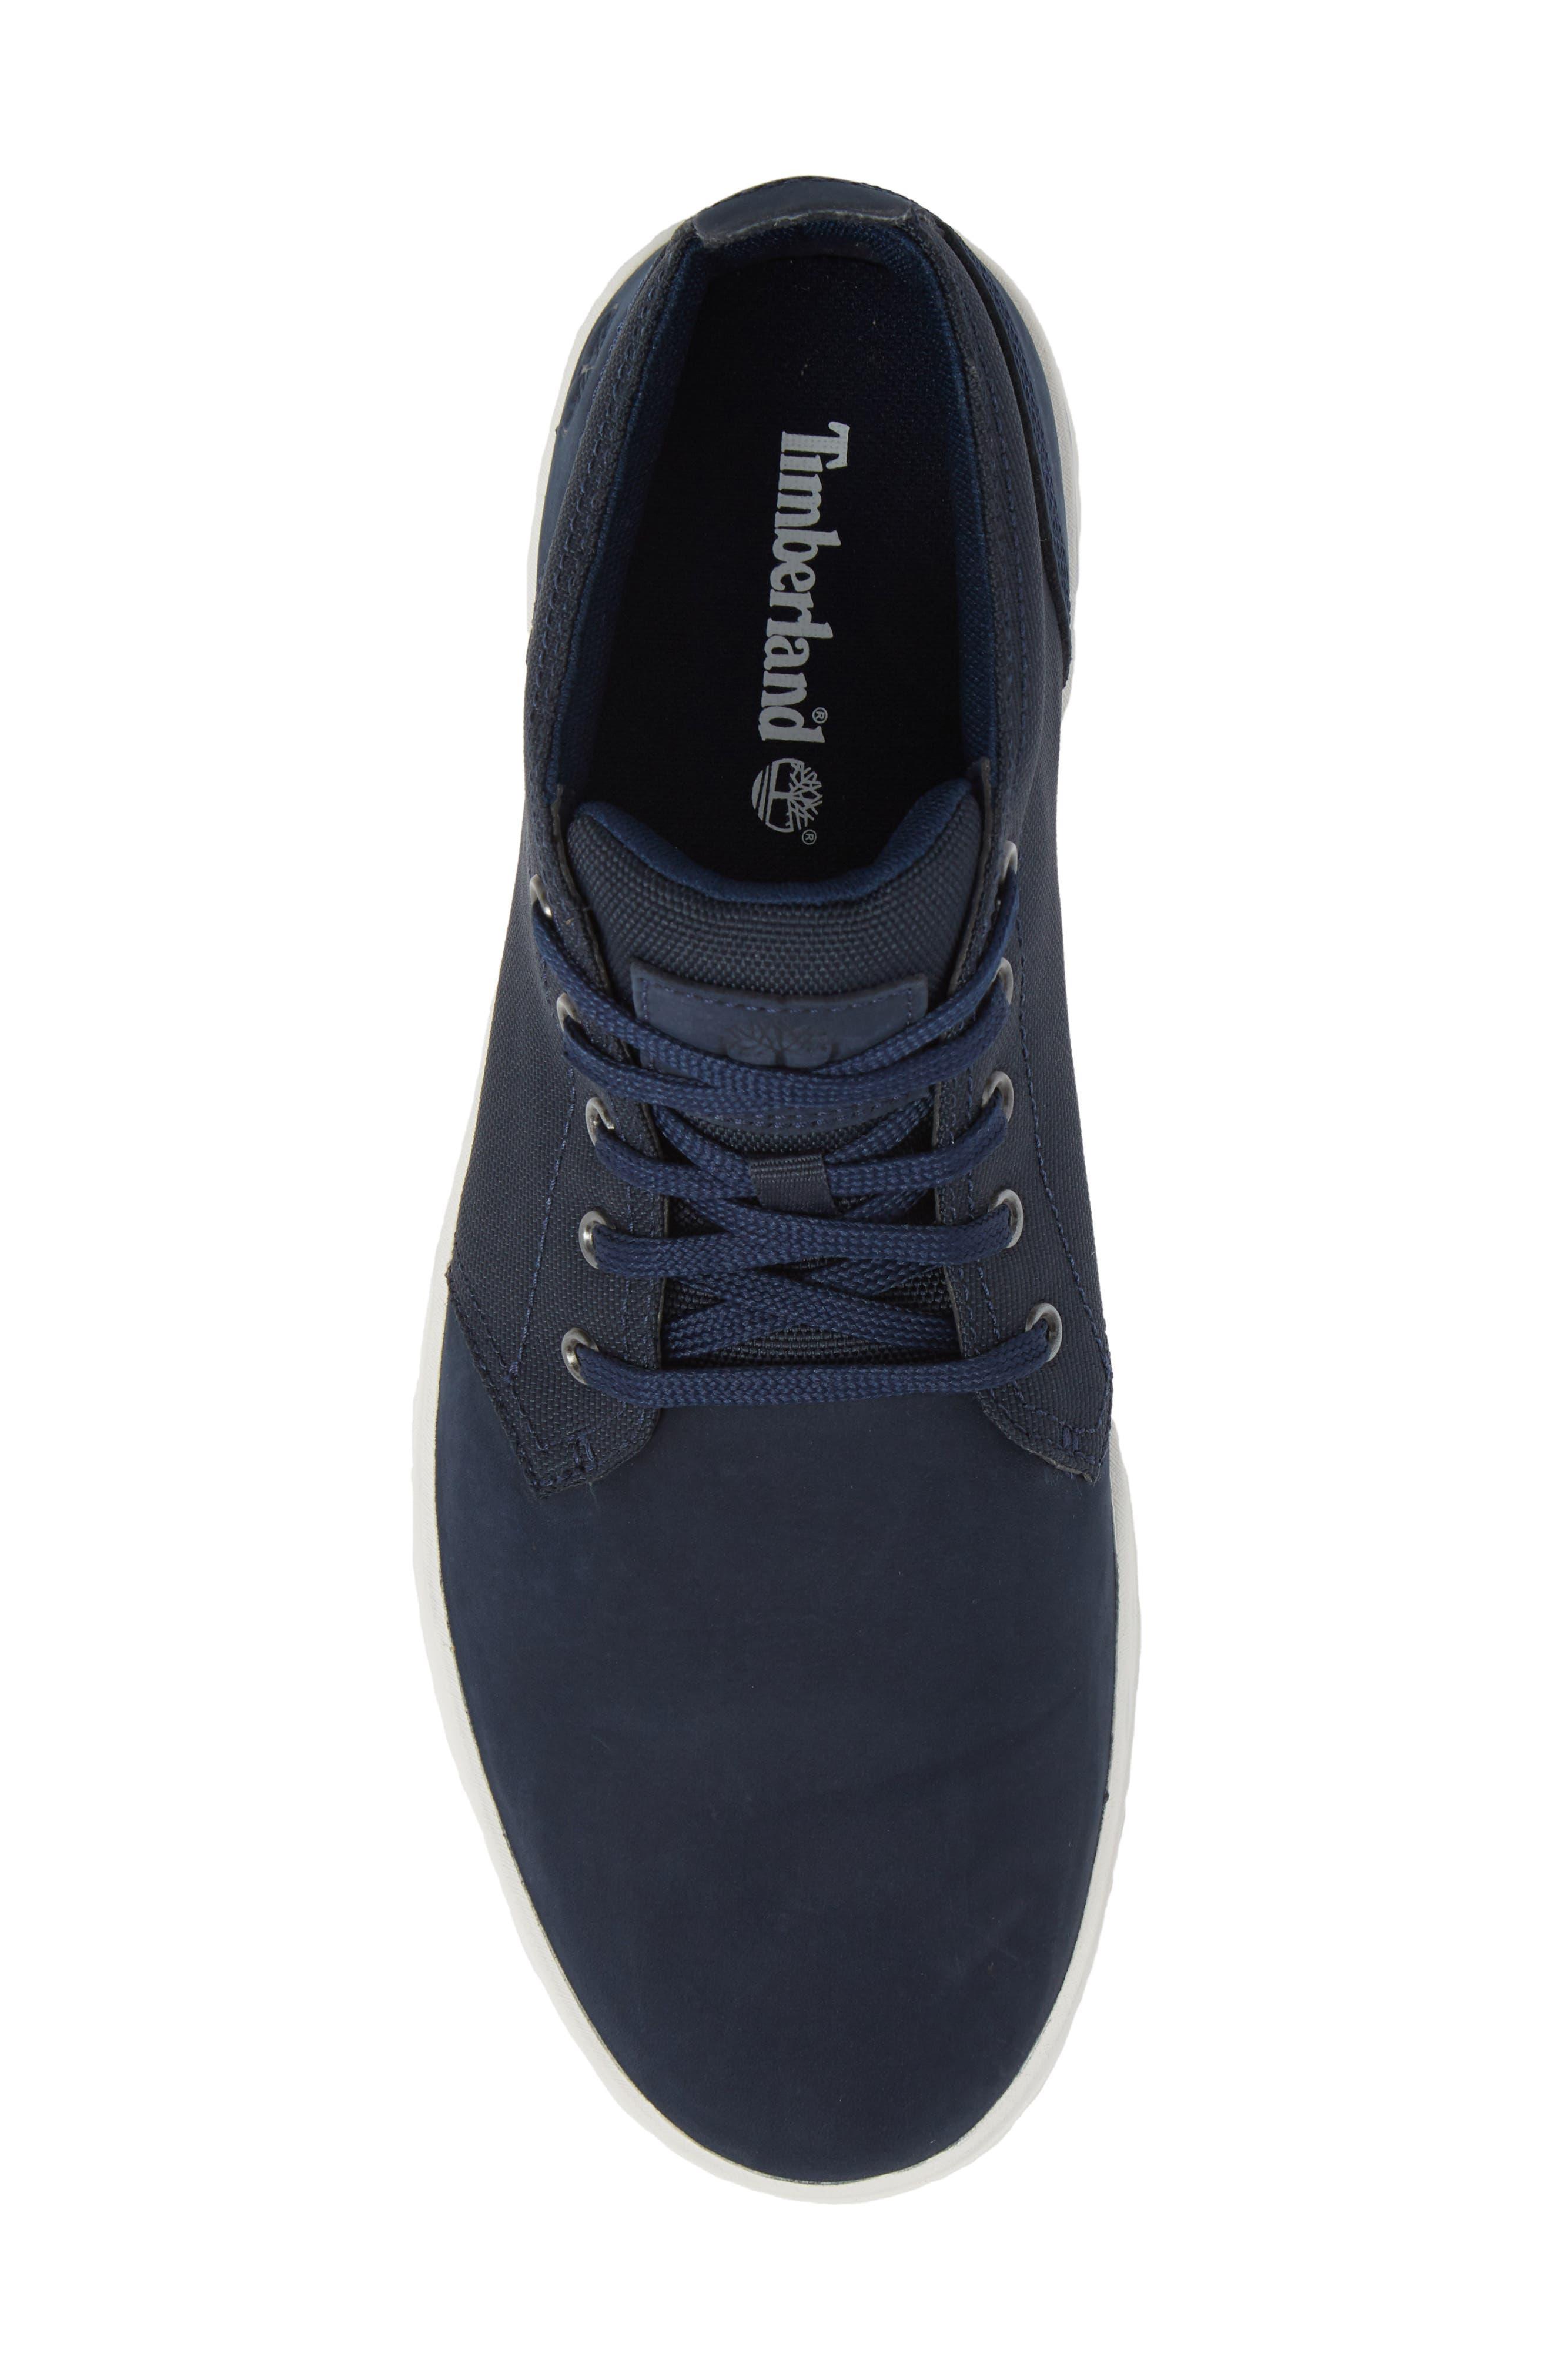 Davis Square Mid Top Sneaker,                             Alternate thumbnail 3, color,                             Black/ Blue